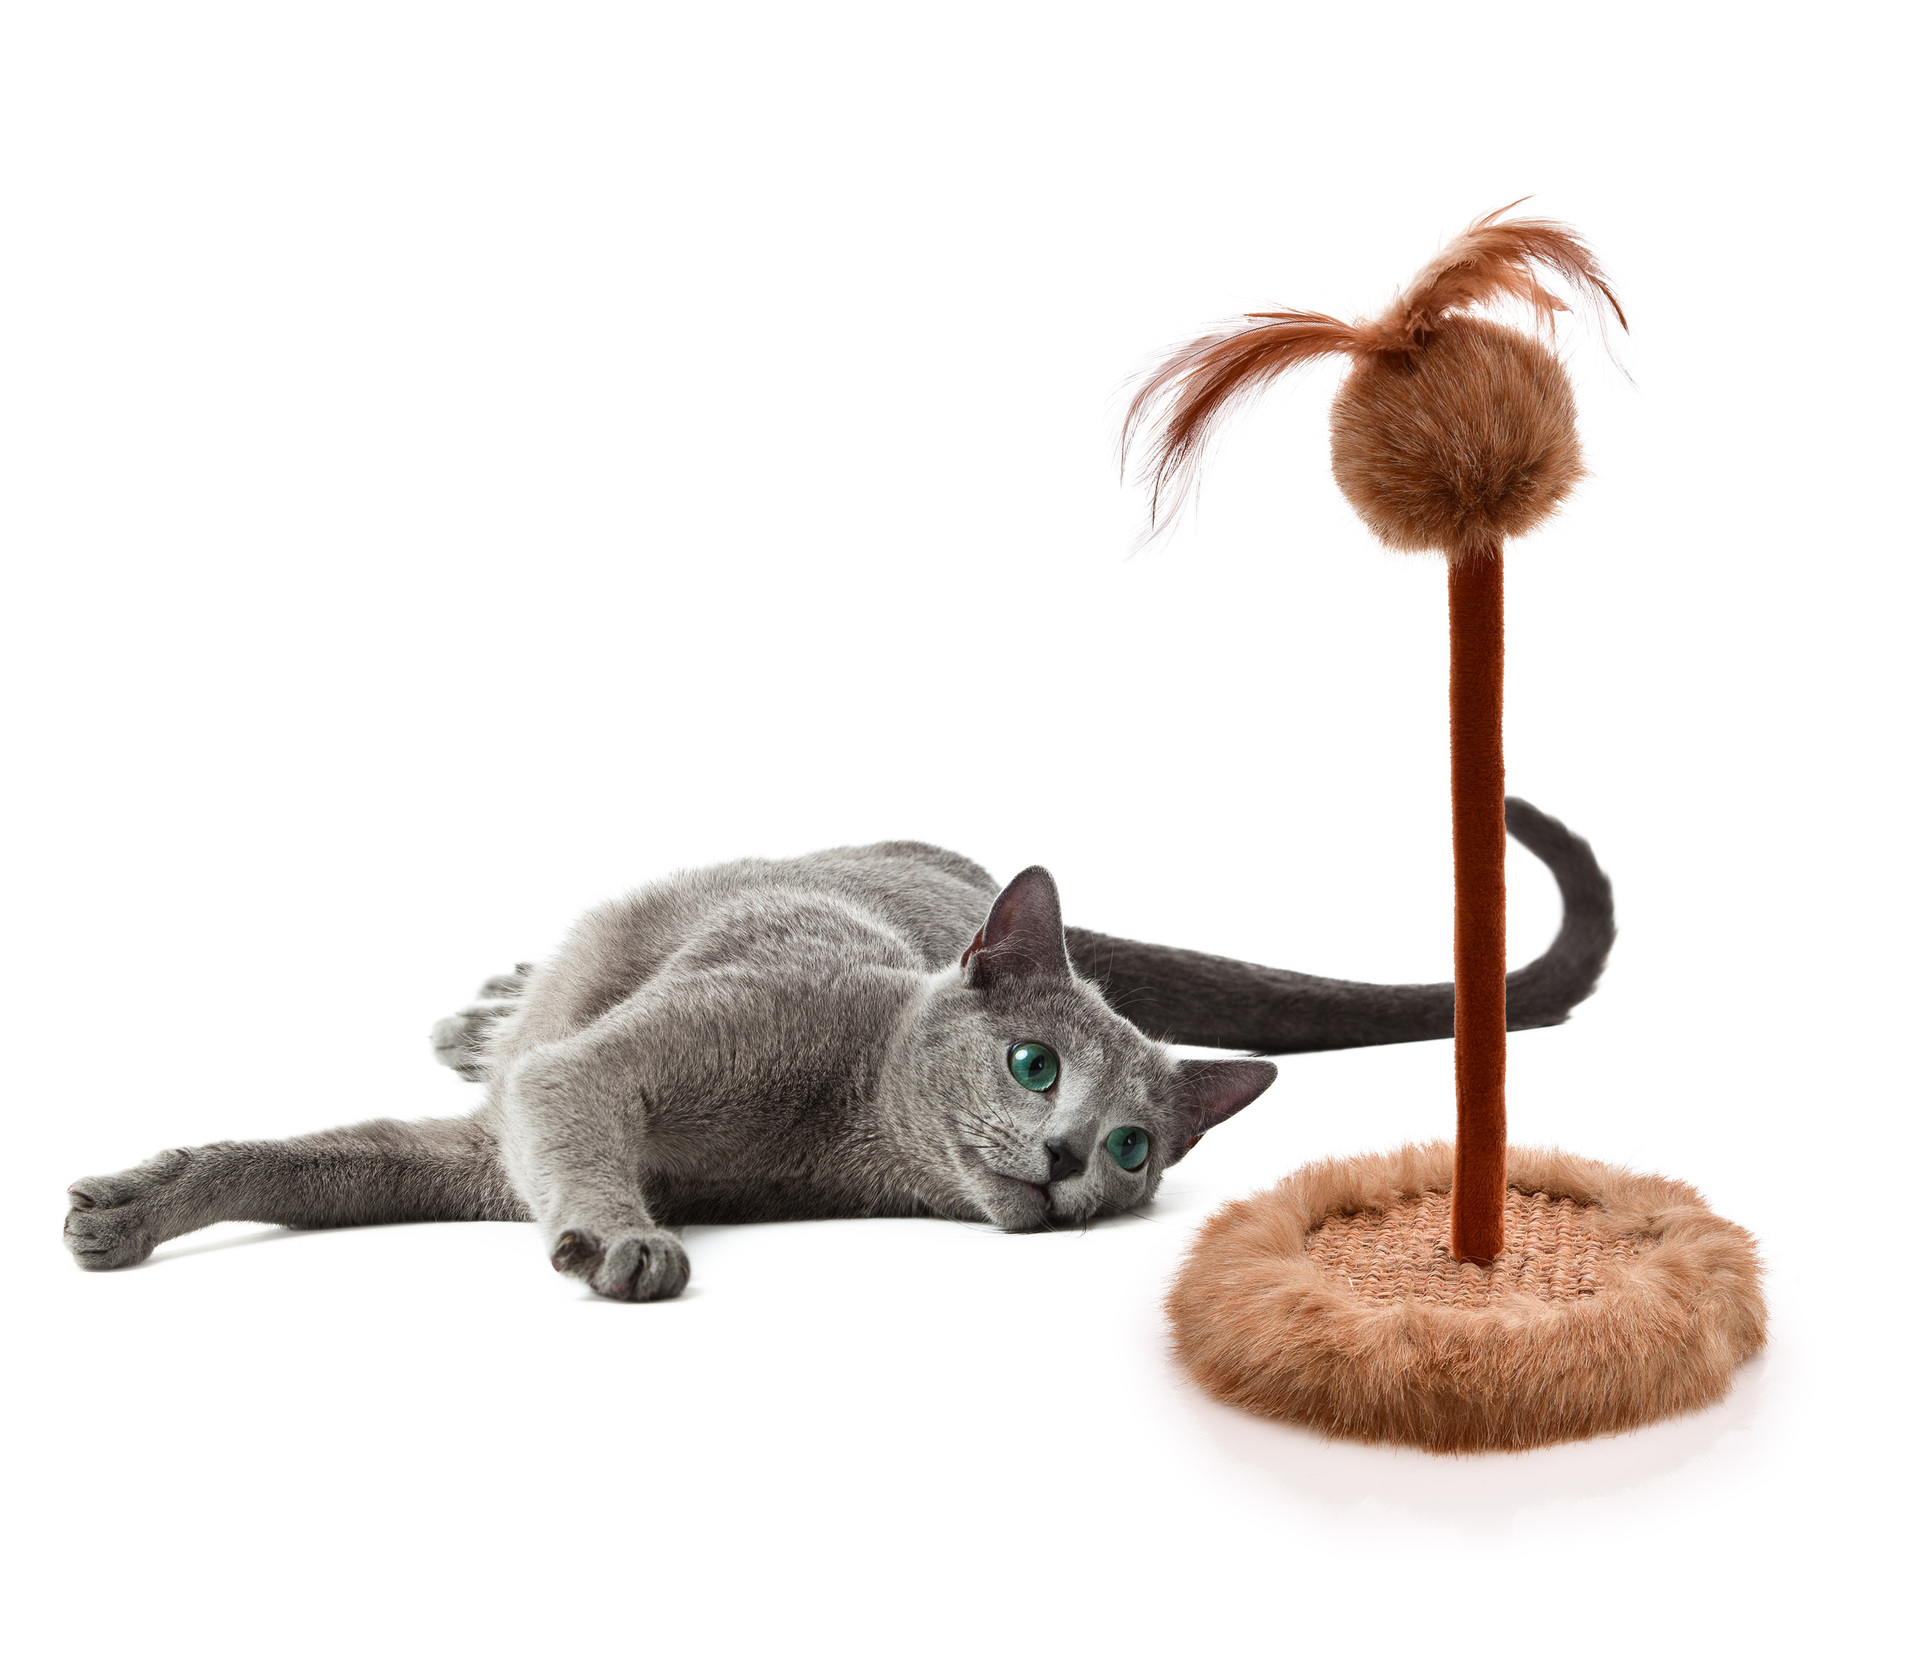 Kočičí škrabadlo, s hračkou na pružném pérku